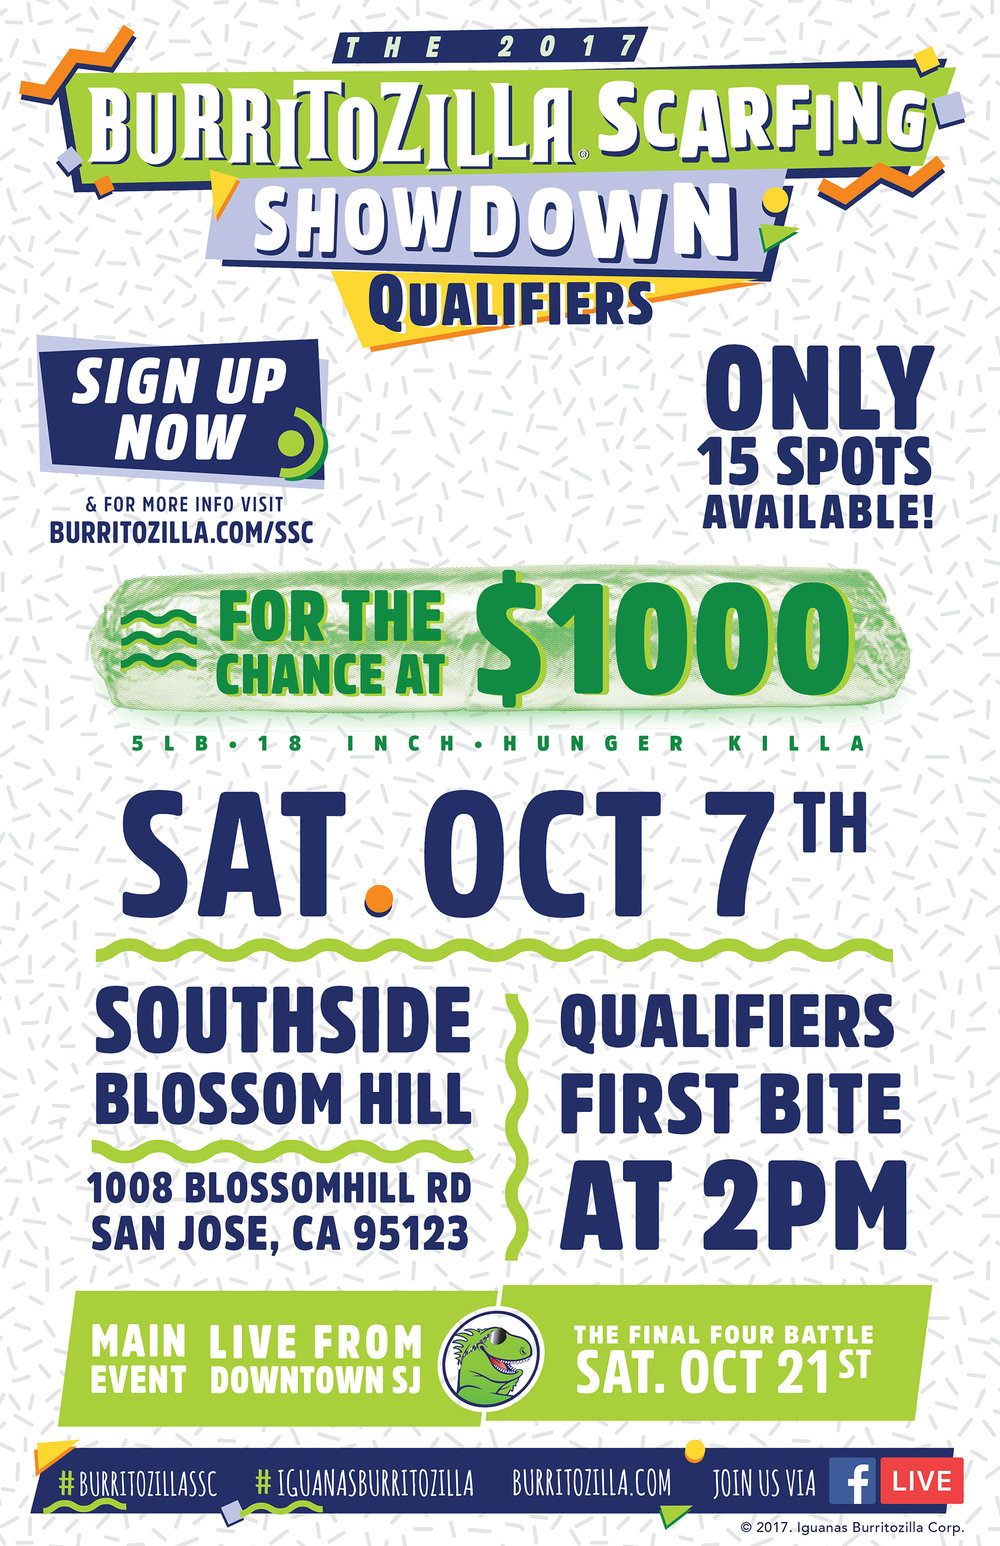 SSC2017_Qualifier Poster_11x17.jpg